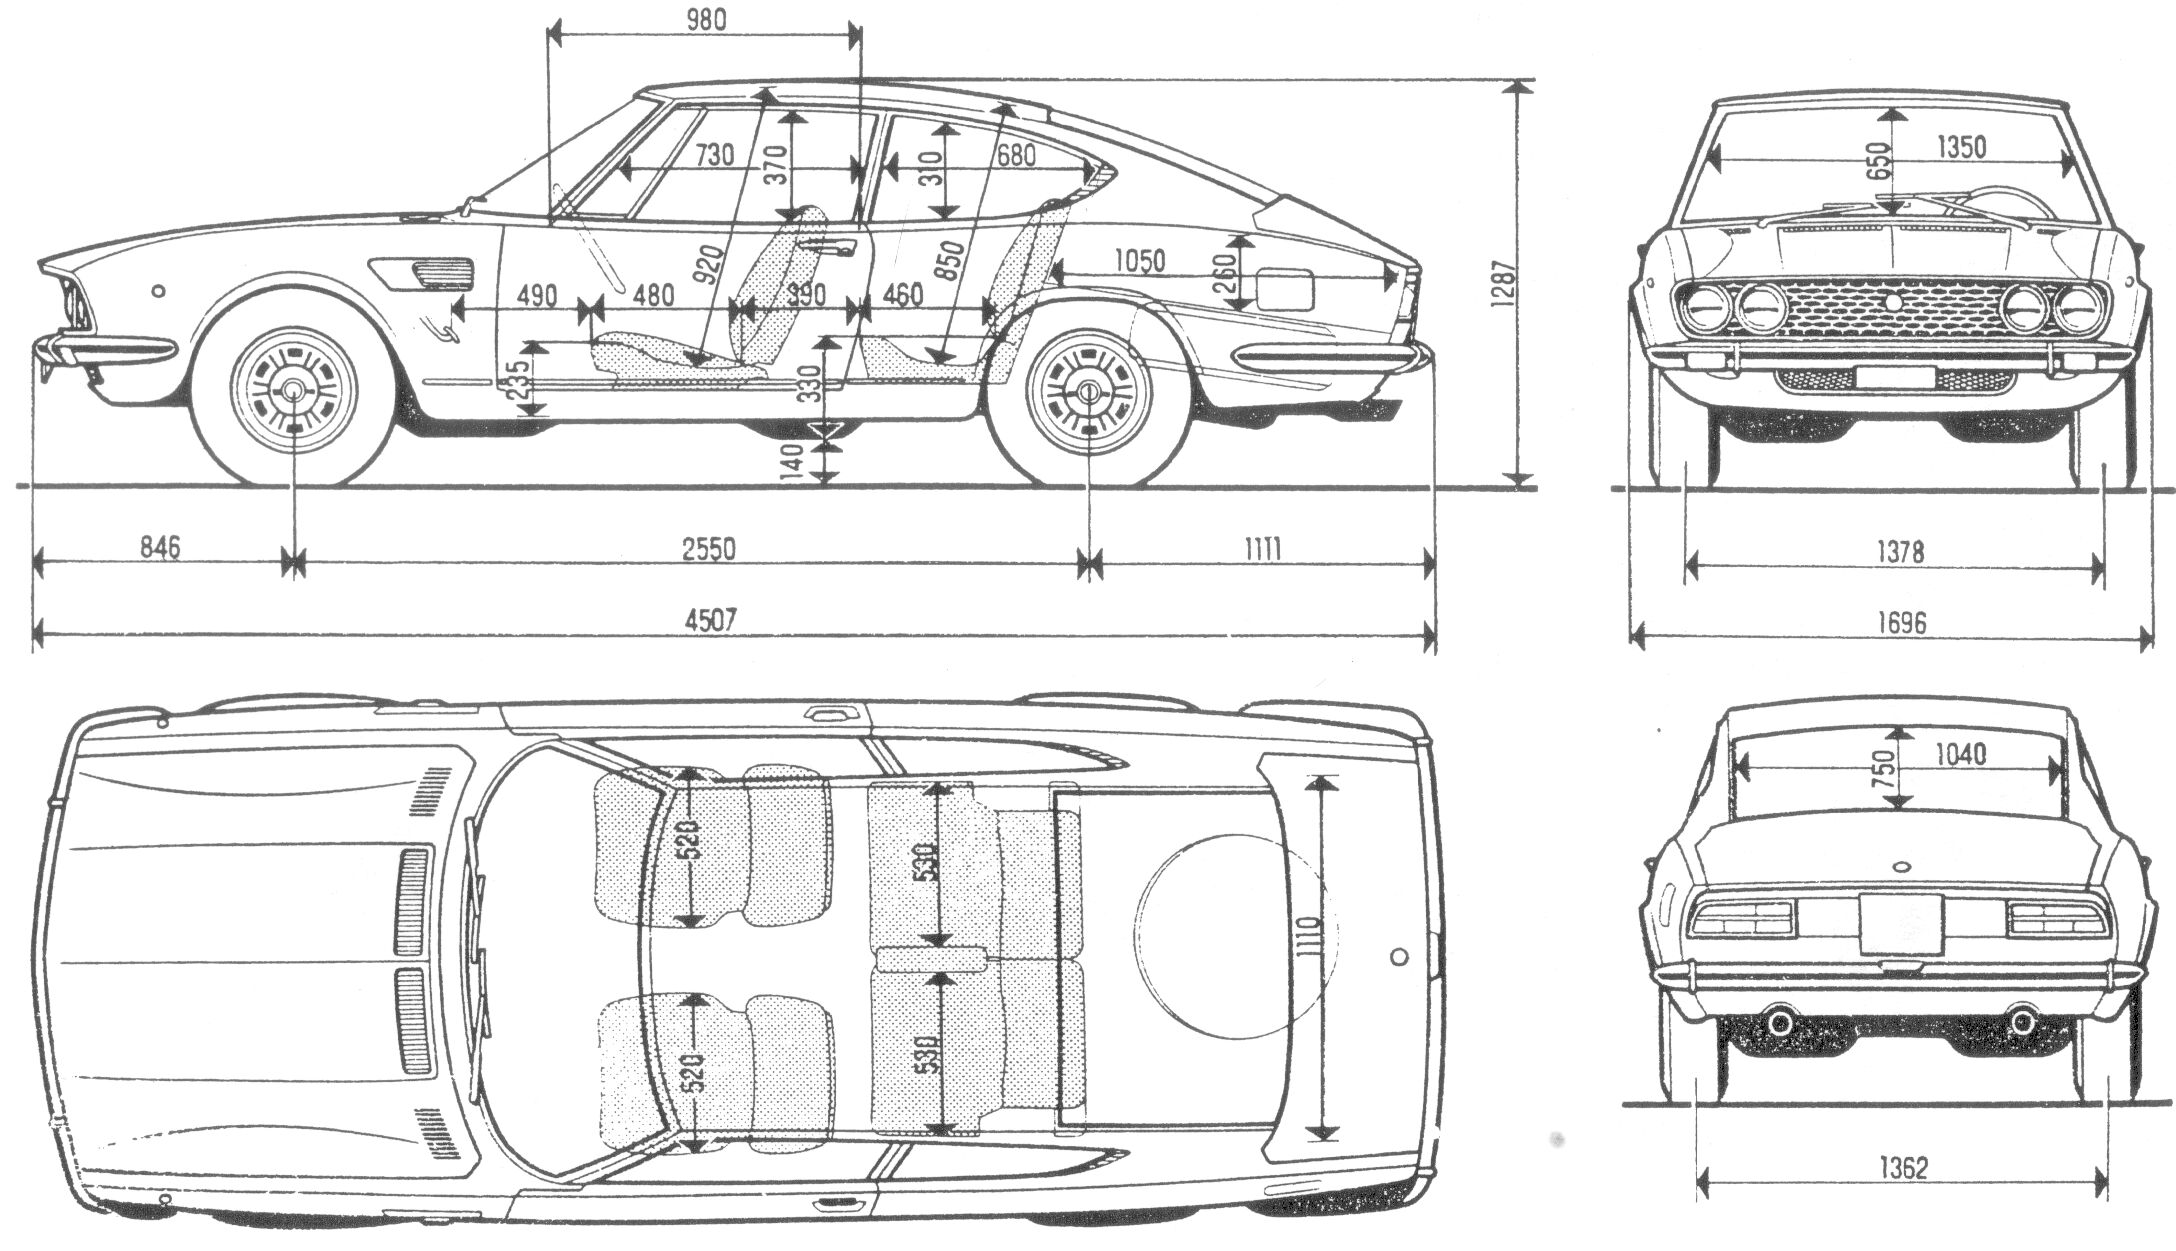 Fiat Dino blueprint